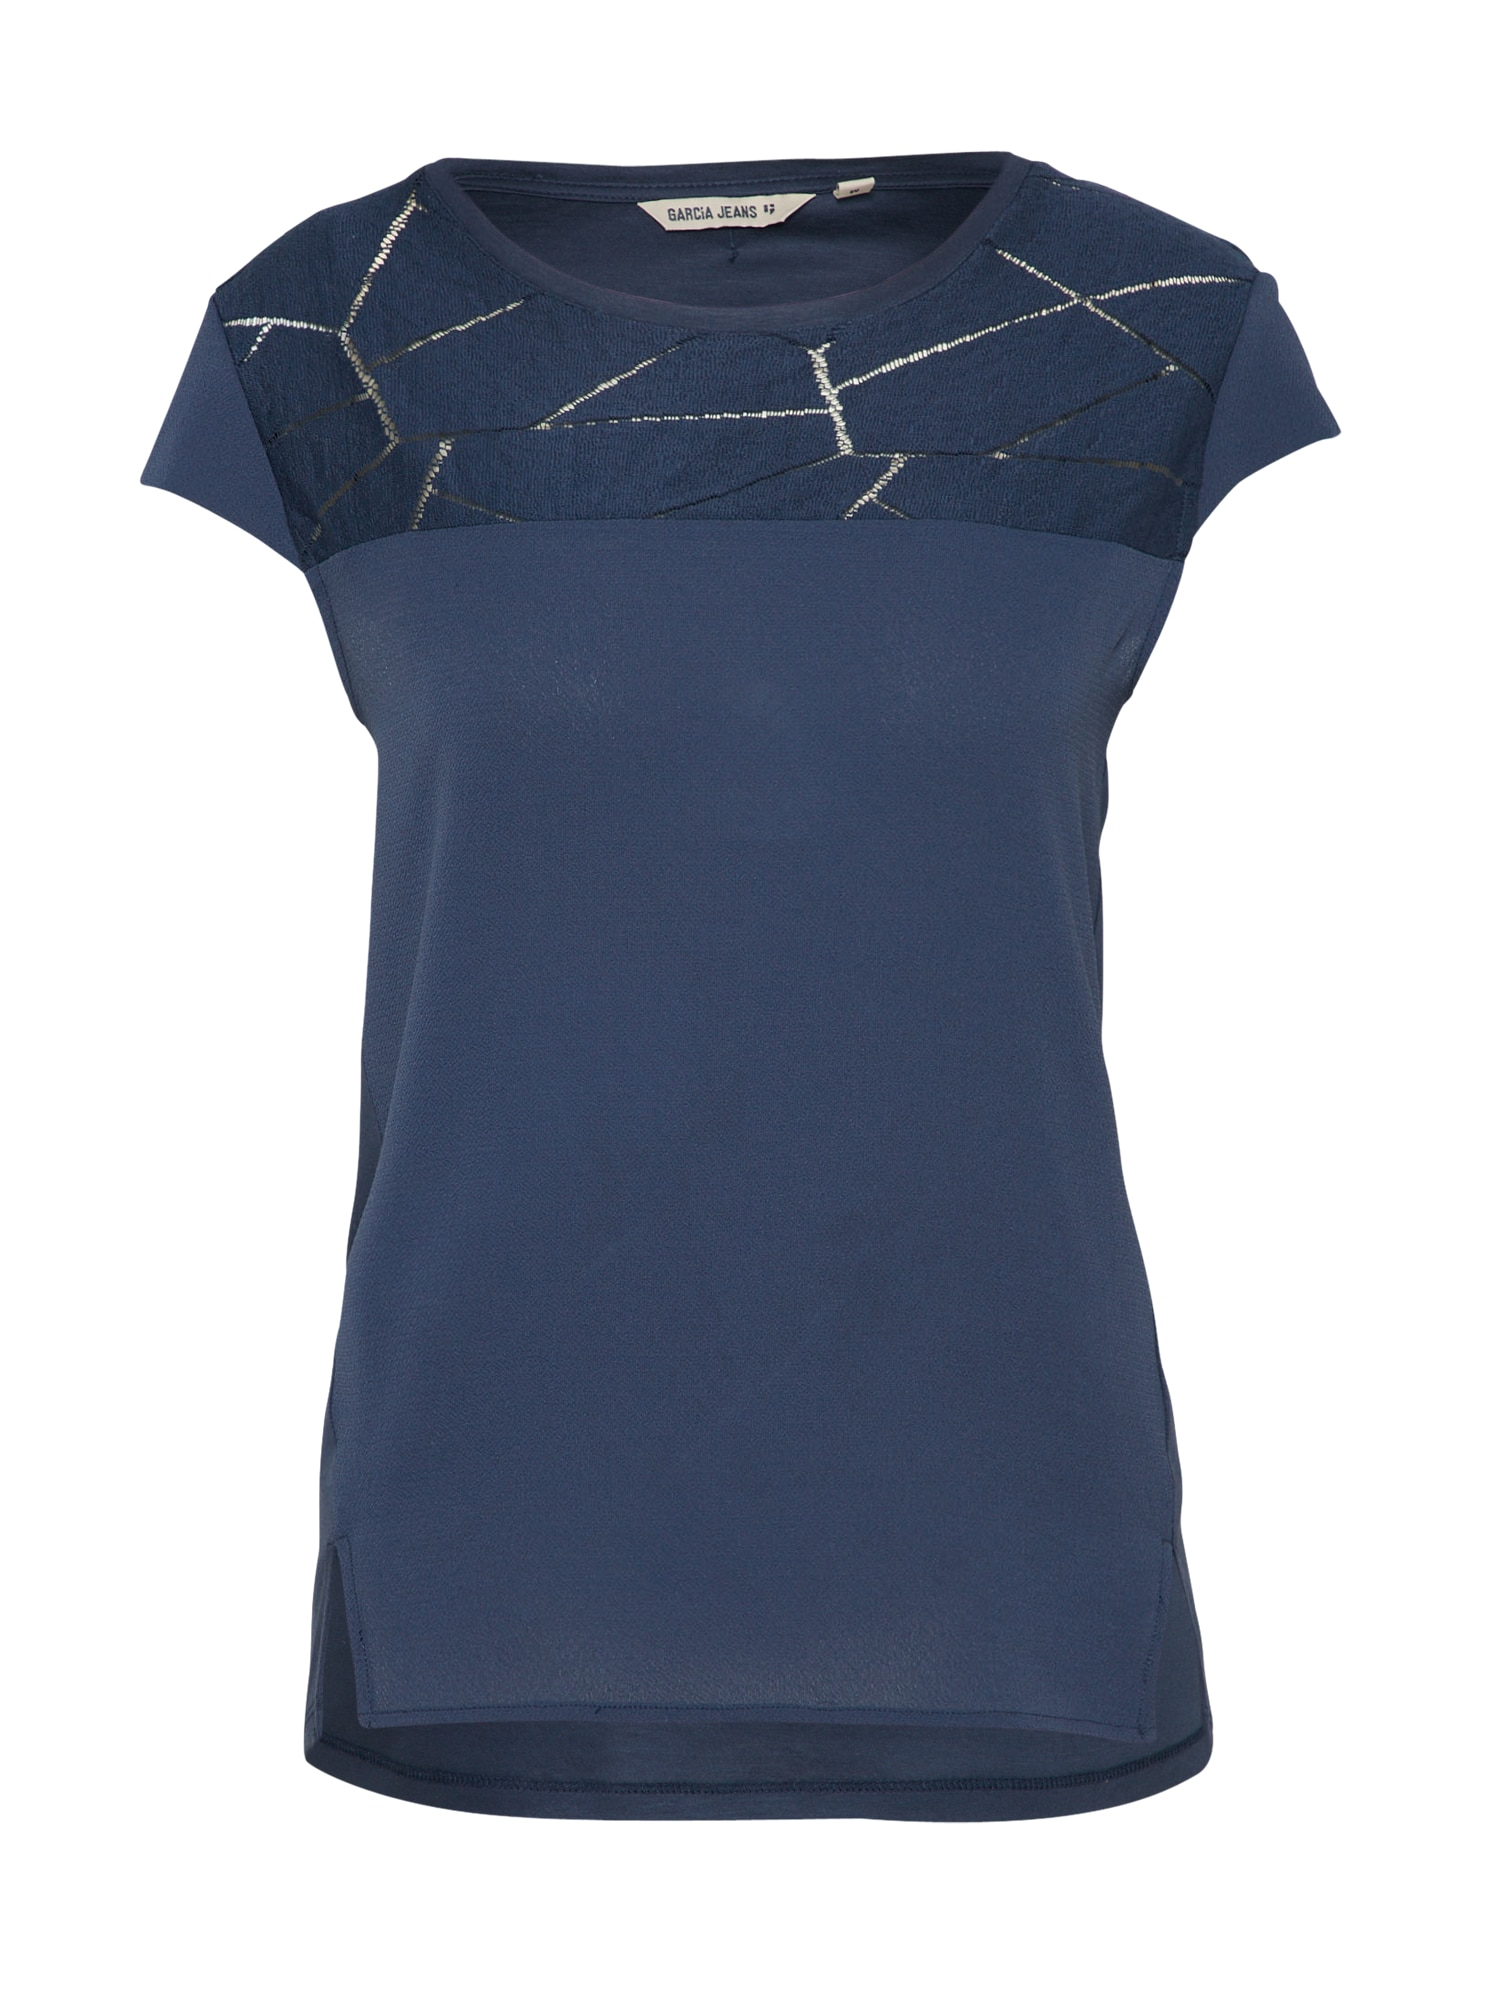 GARCIA, Dames Shirt, marine